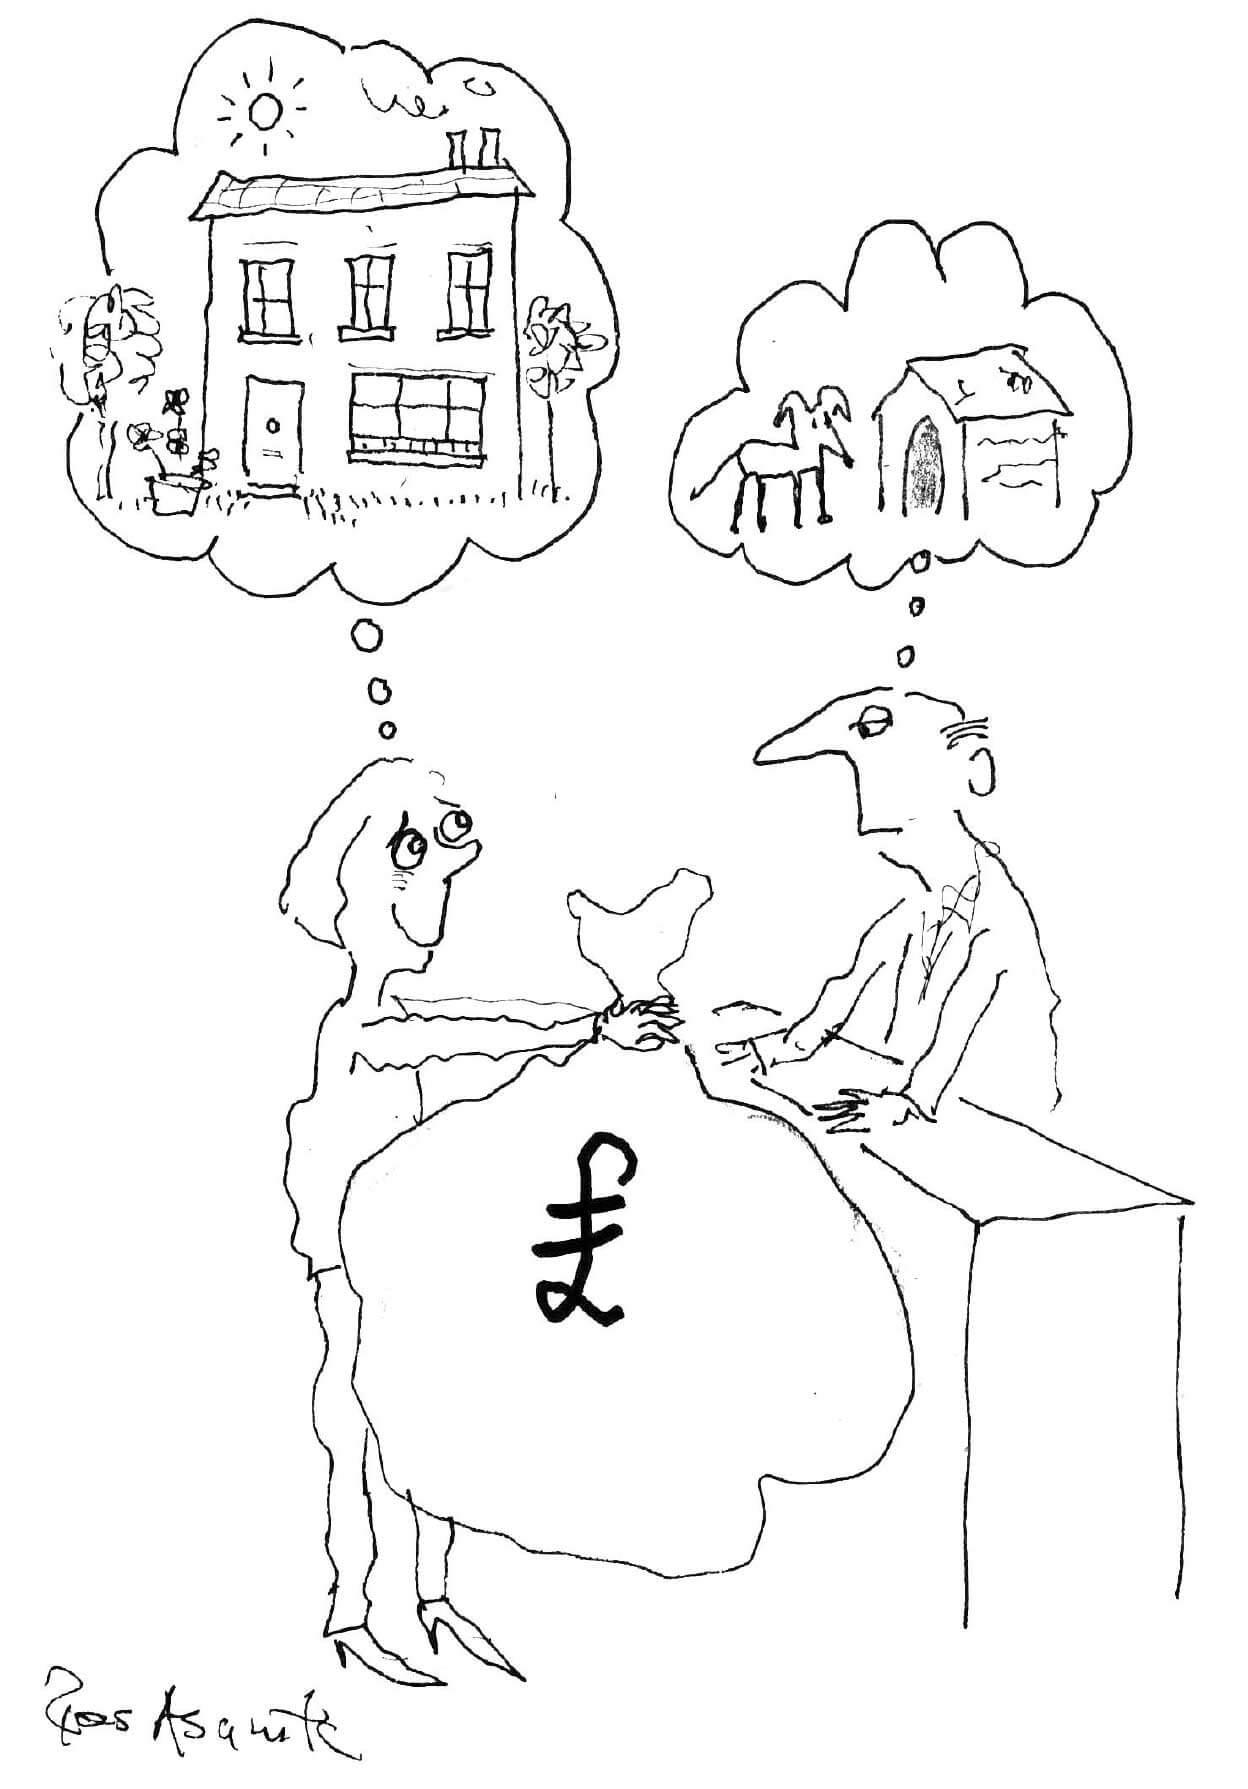 Ruth Whitehead Associates - mortgages cartoon